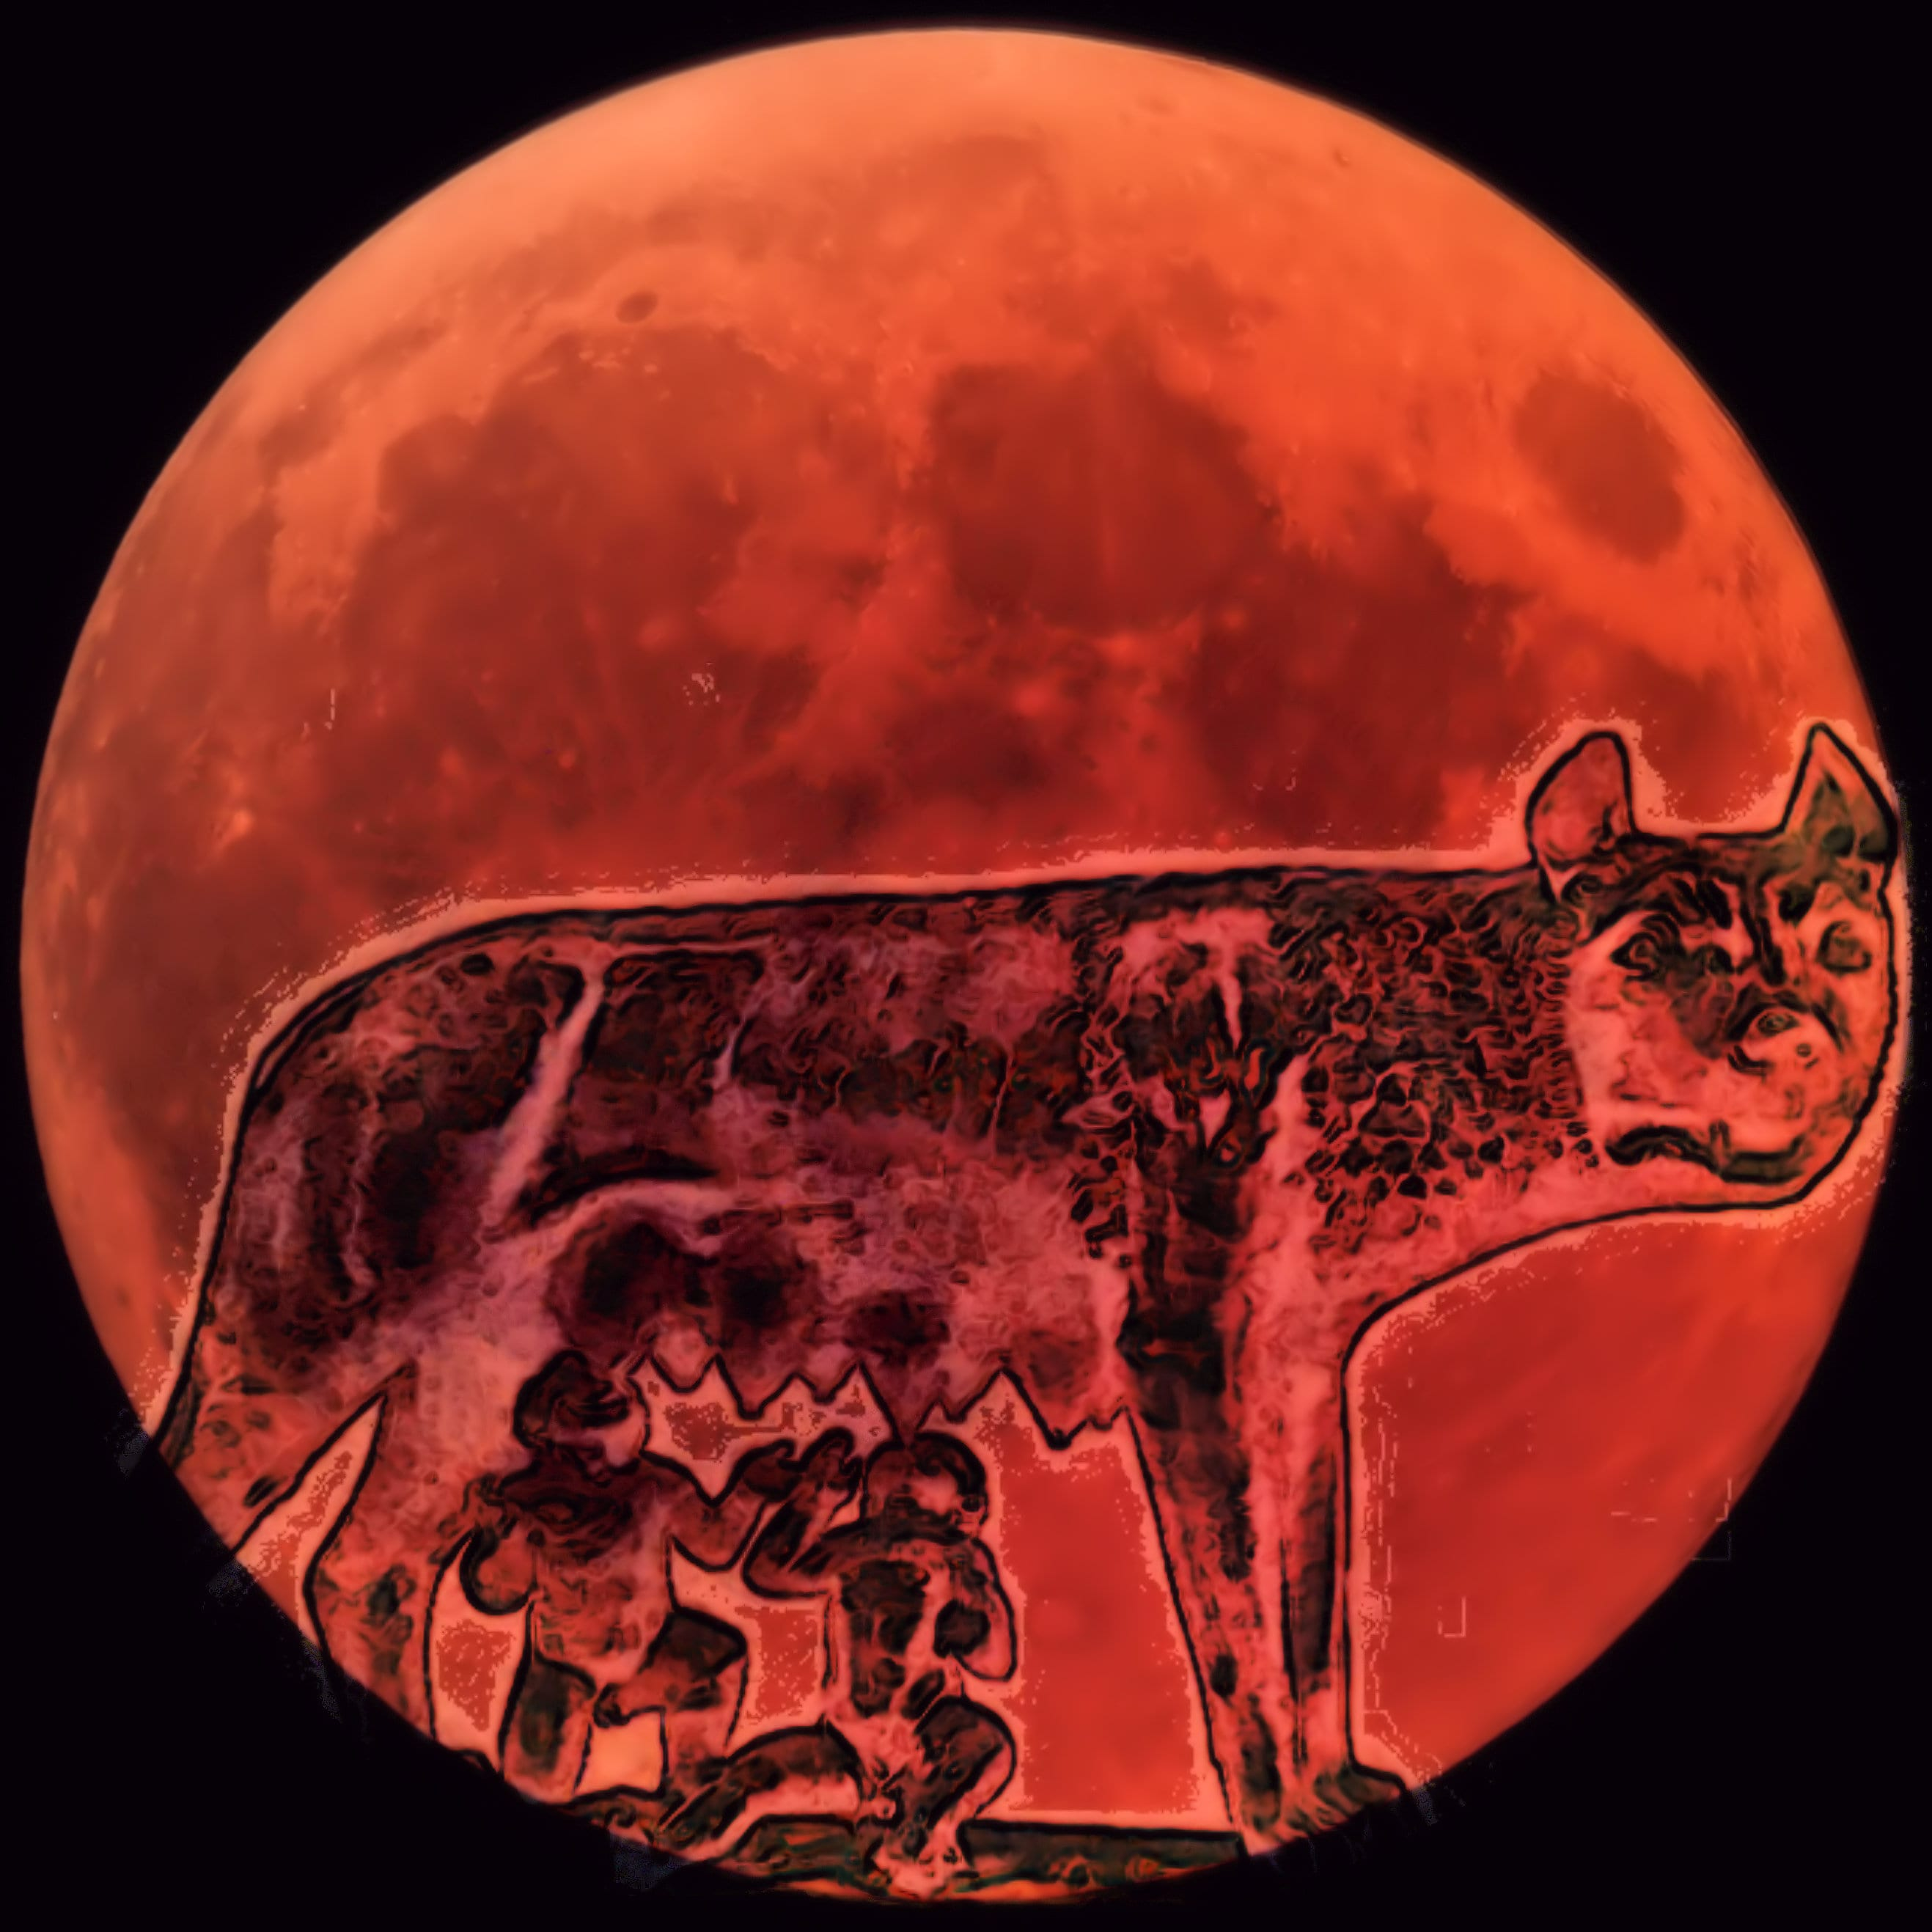 blood moon january 2019 side effects - photo #20